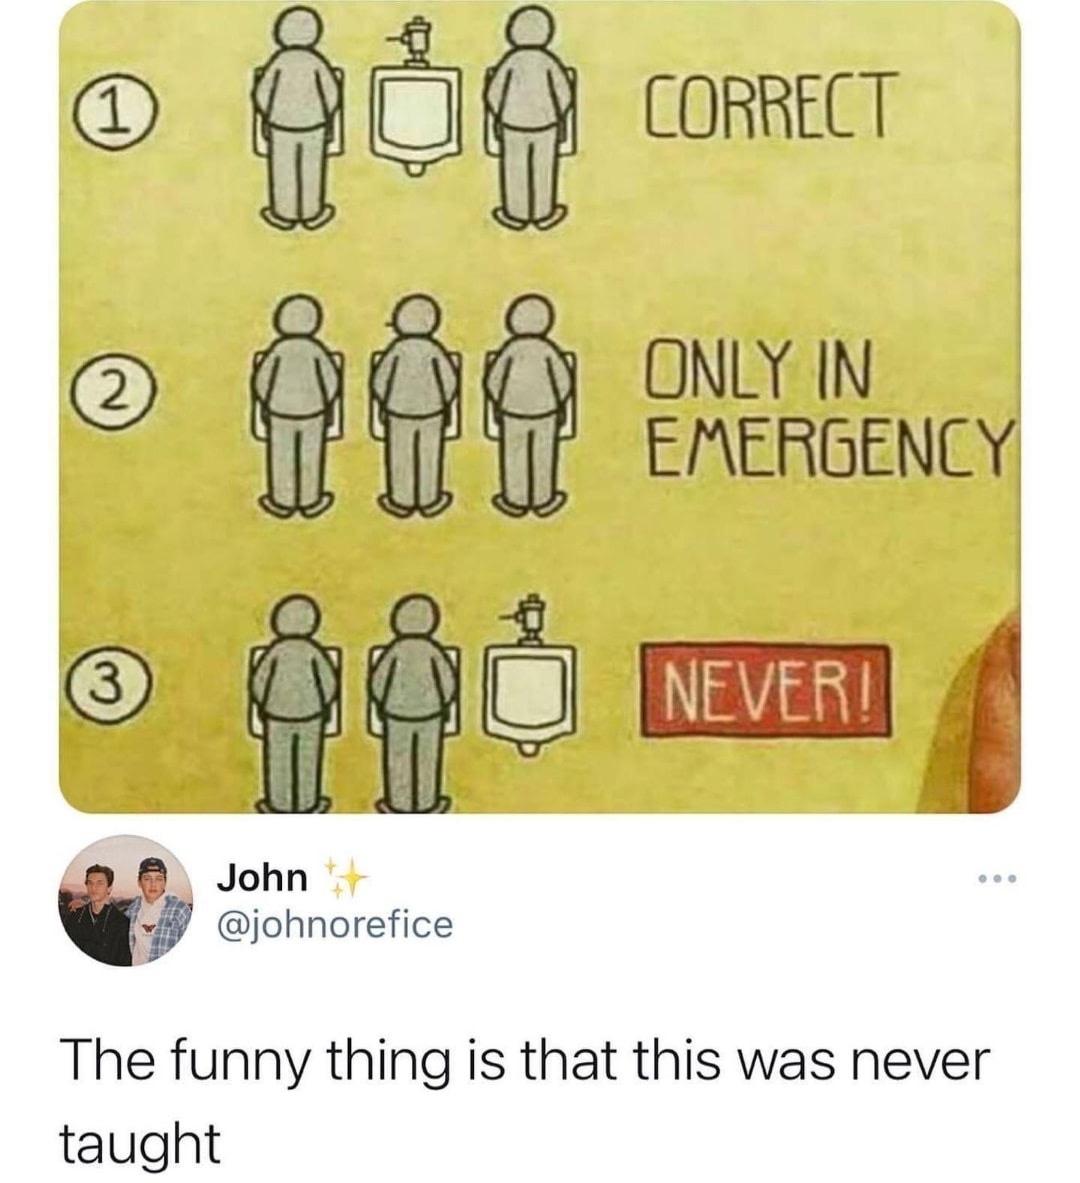 It's common knowledge - meme